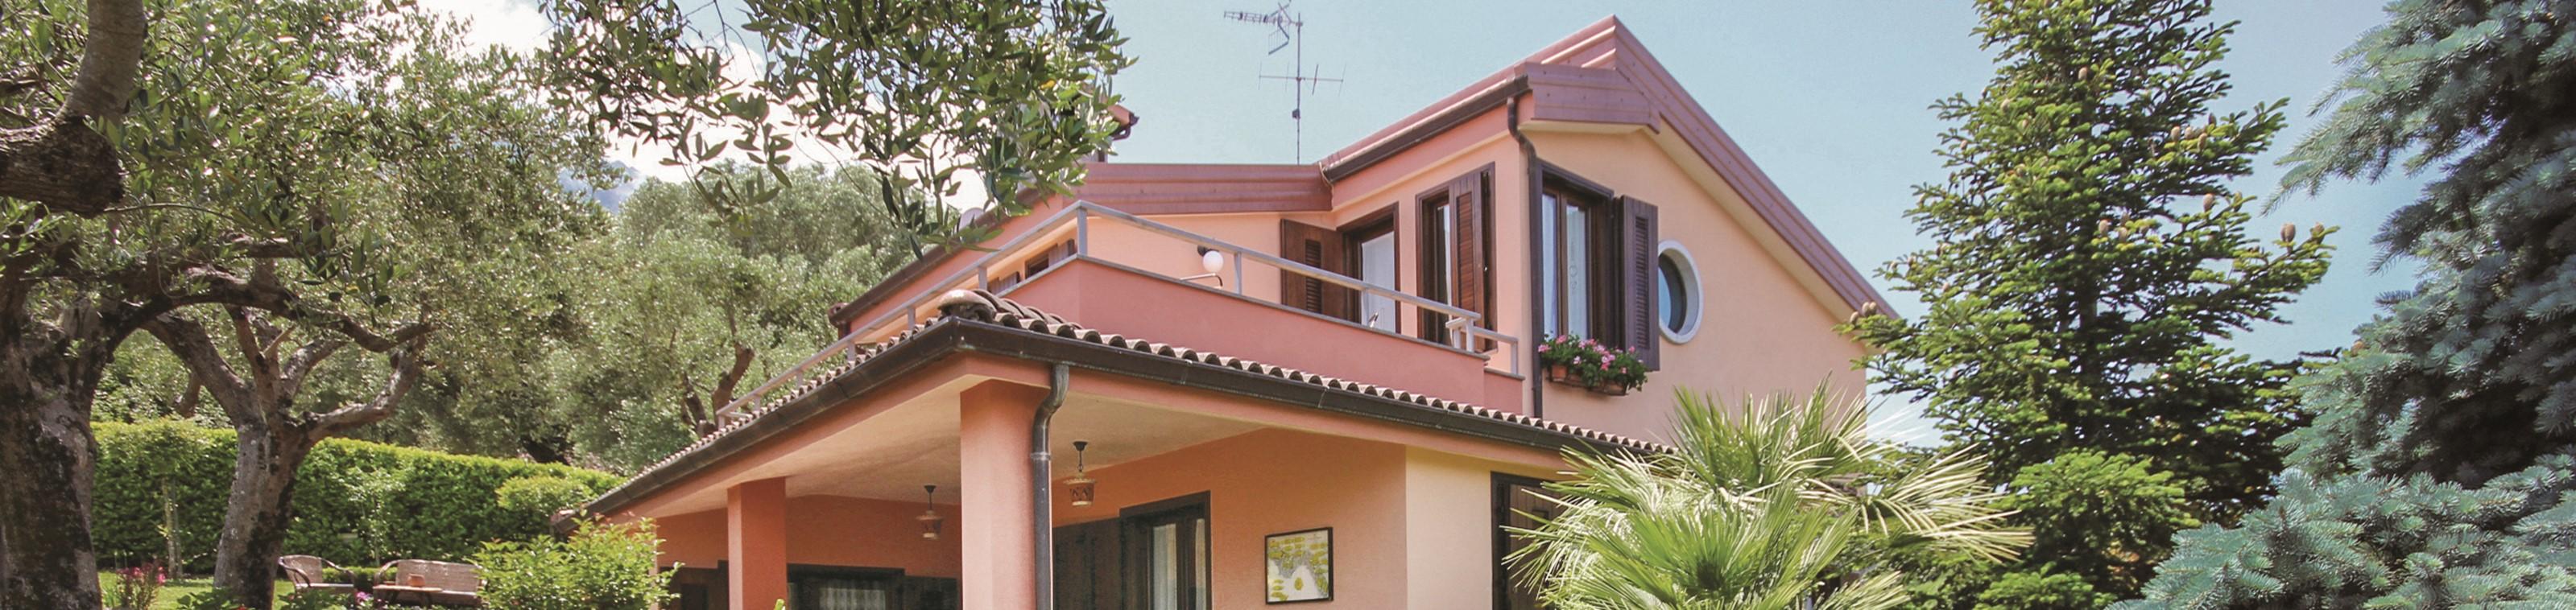 Villa Francesca: gezellige vakantiewoning in Italiaanse Campania